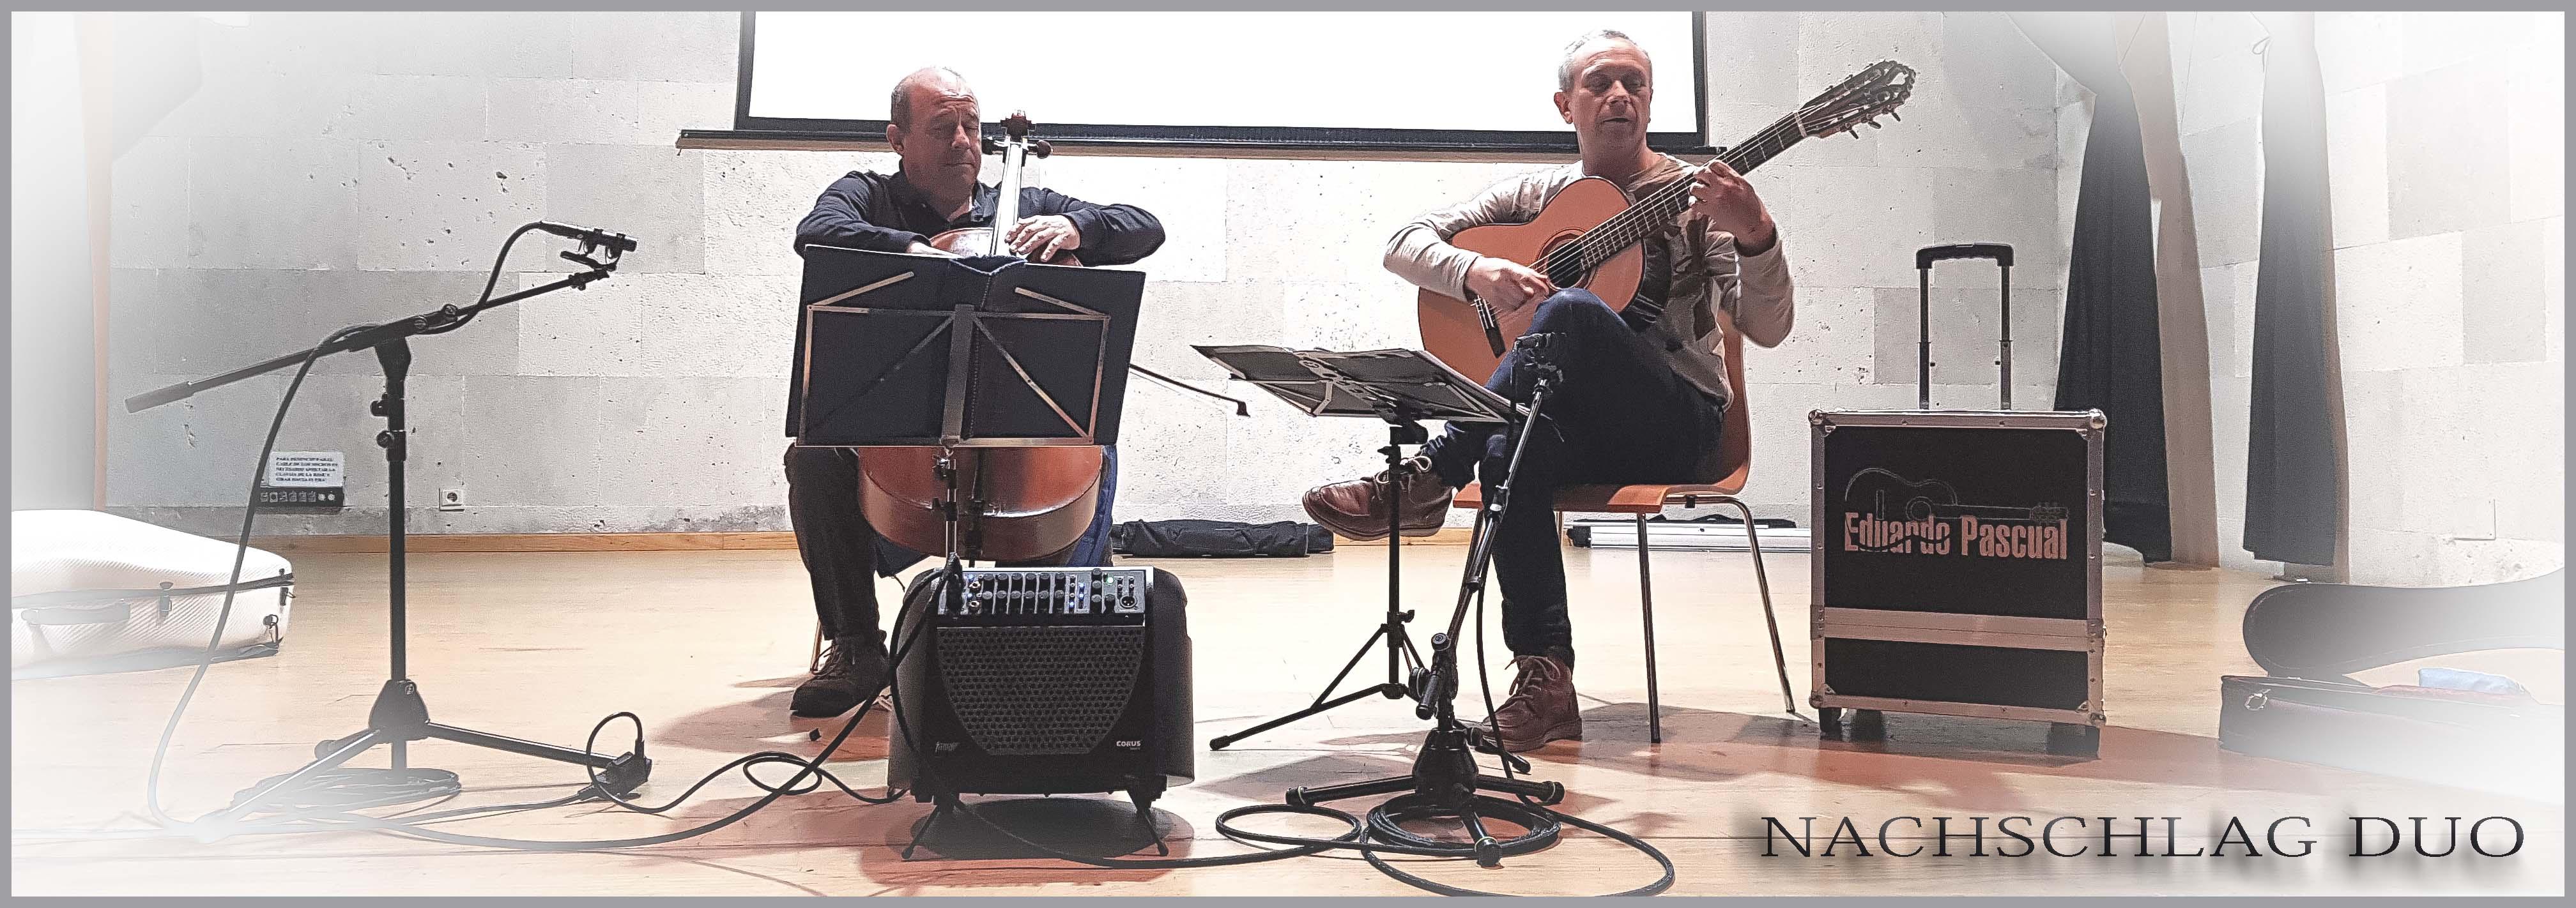 NACHSCHLAD DUO _ Festival Guitarra i Vi Betxi (Spain)